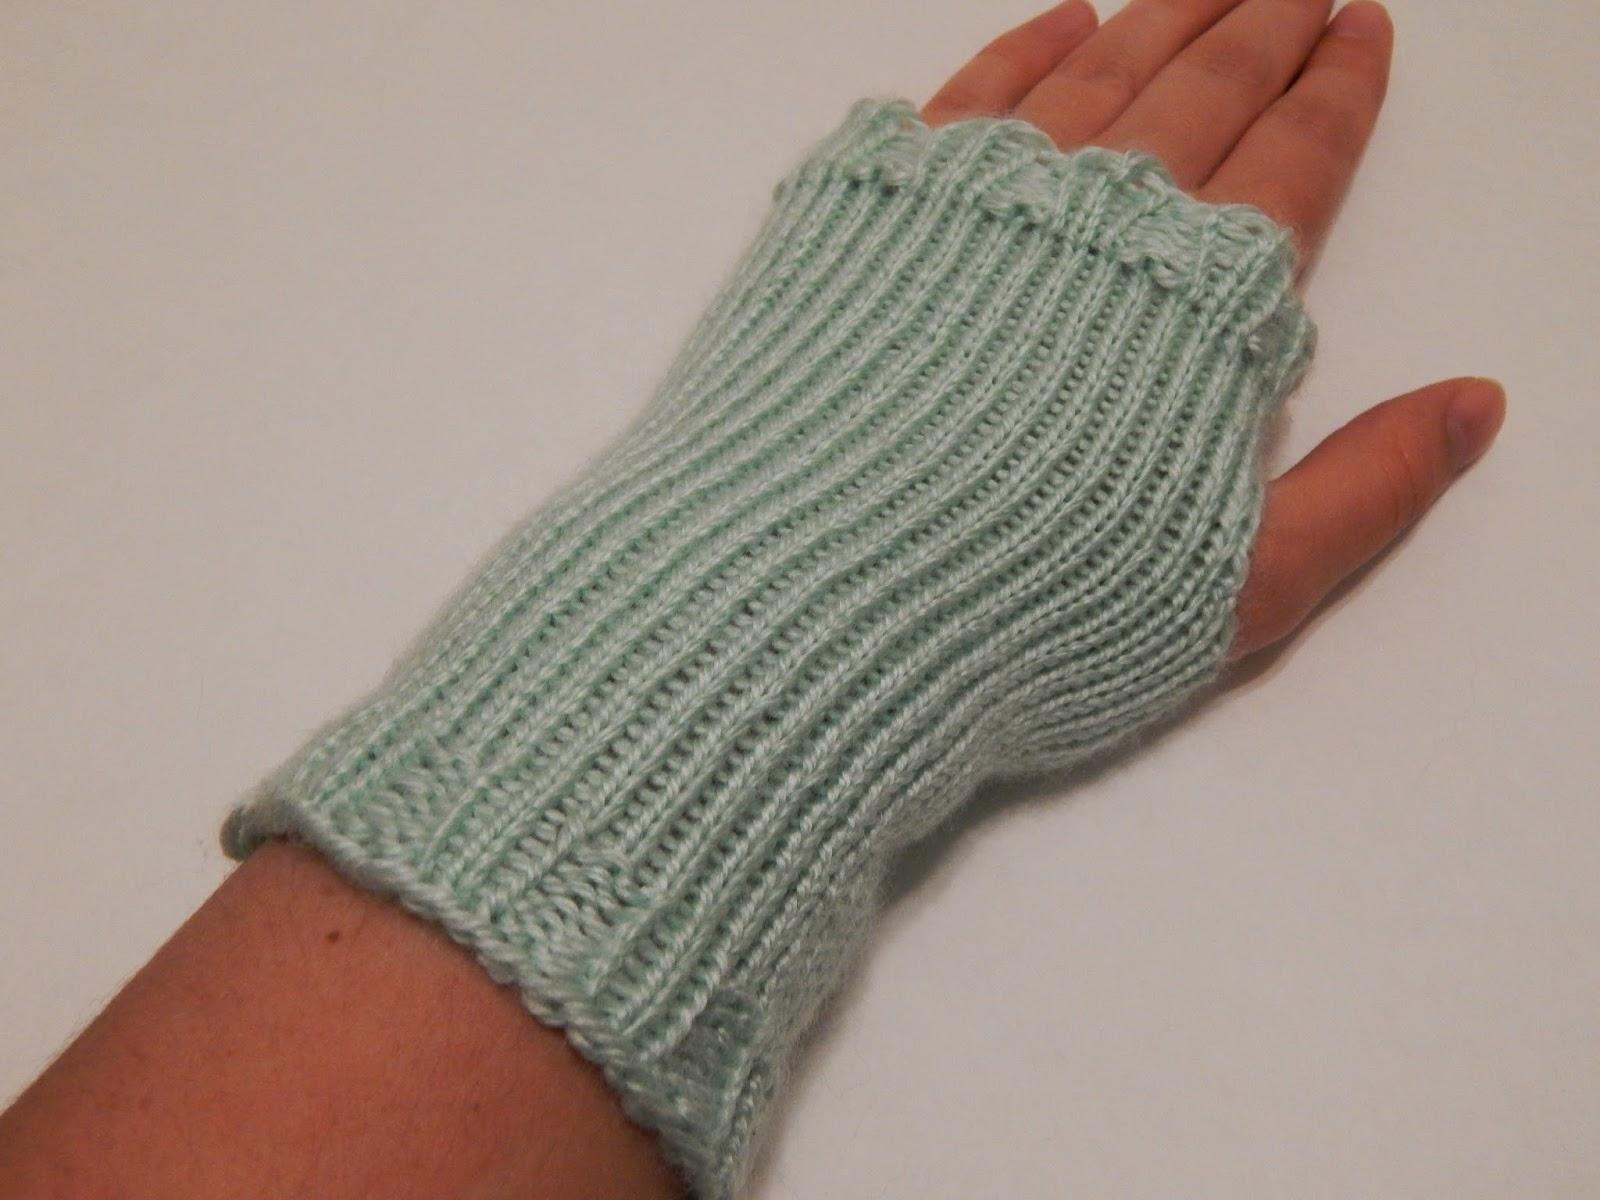 Knitting Mittens On A Loom : Jovial knits loom knit fingerless gloves shizknit